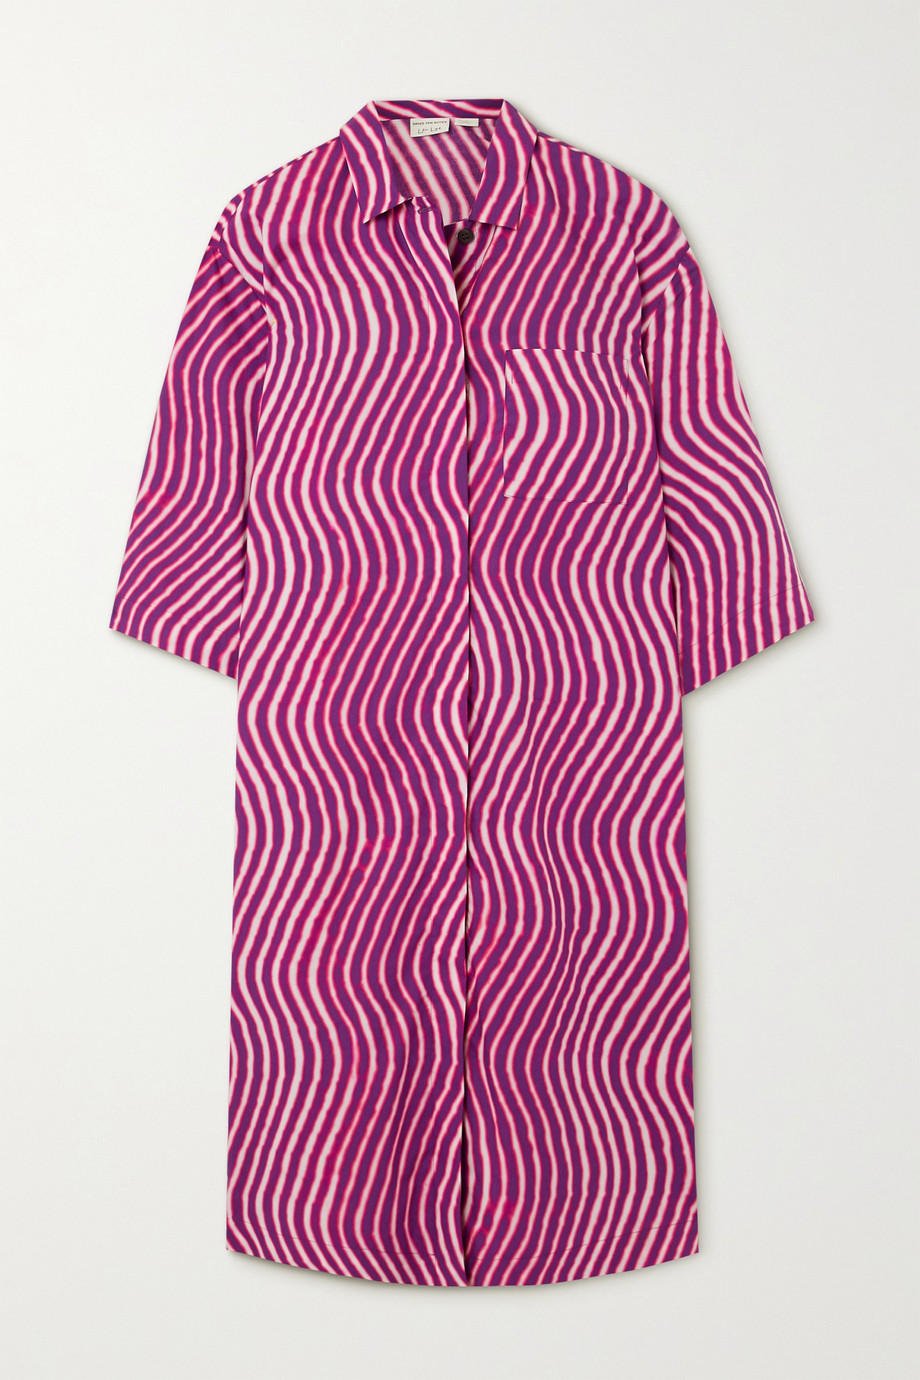 Dries Van Noten Dorali tie-dyed cotton-poplin shirt dress